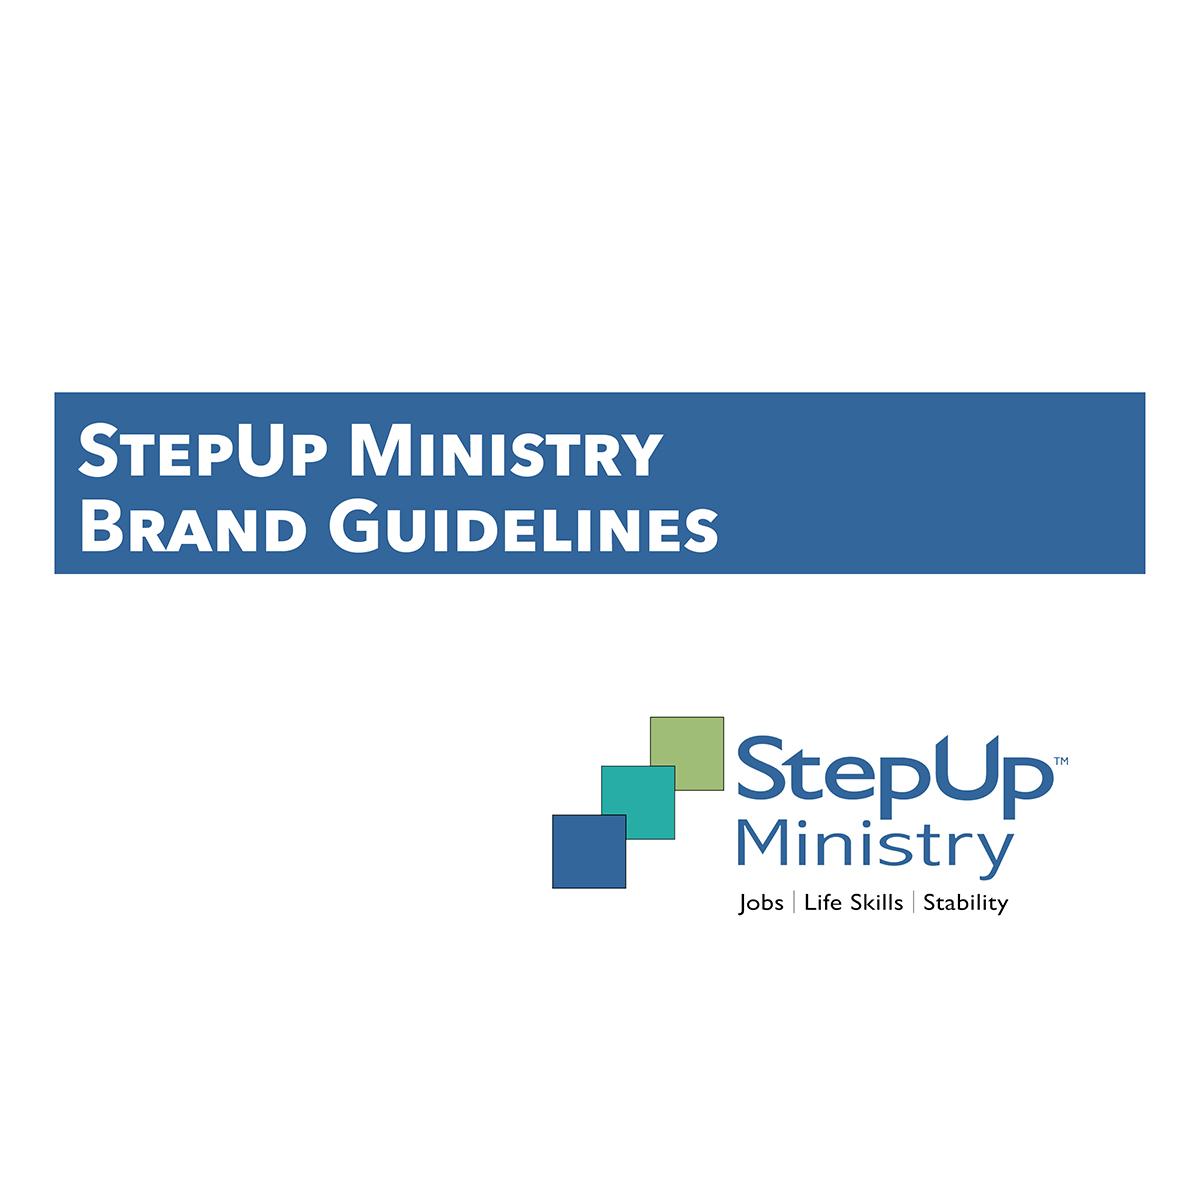 BRAND GUIDELINES - 2018 StepUp Ministry Brand